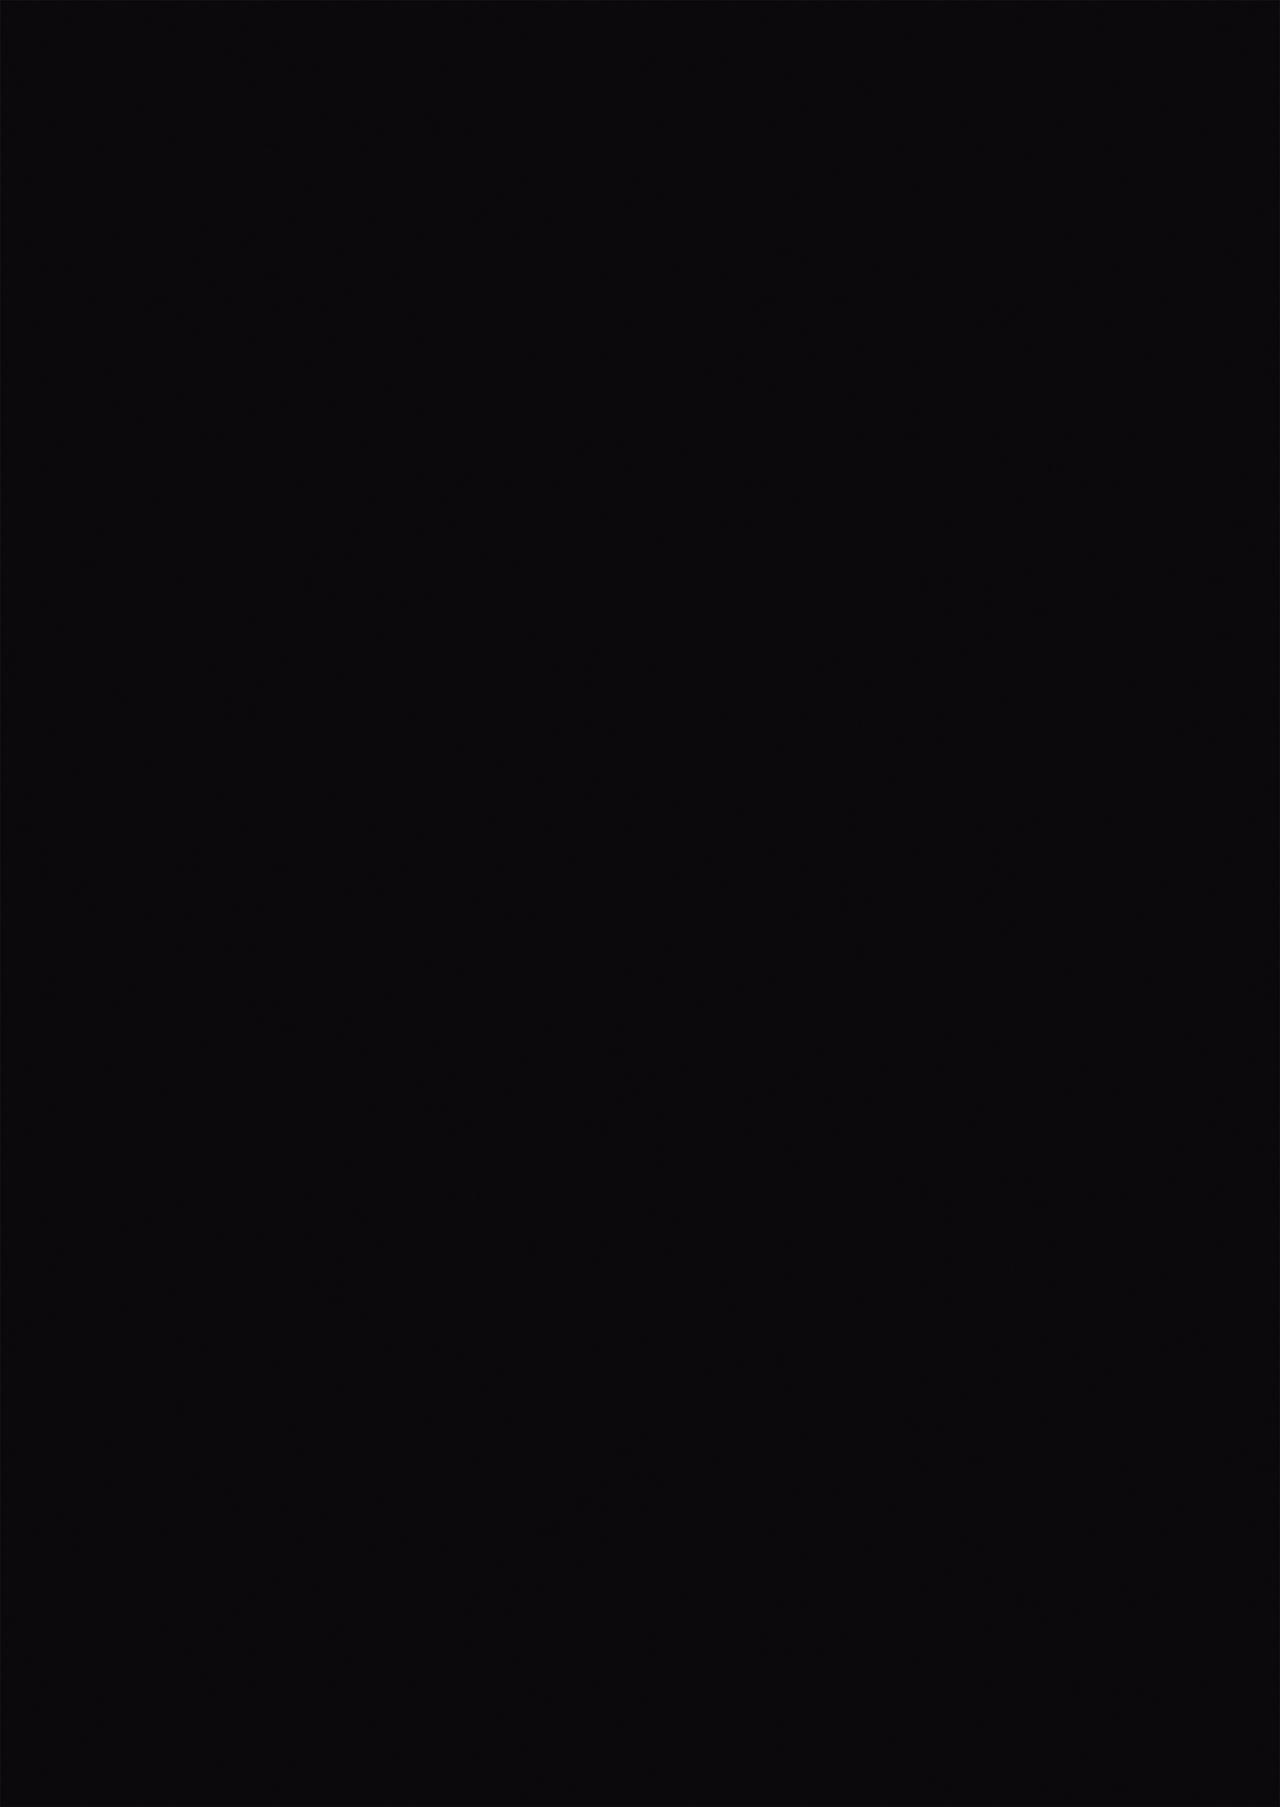 [Remora Works (isaki)] FUTACOLO CO -INHERITANCE- VOL. 004 + Bonus 23